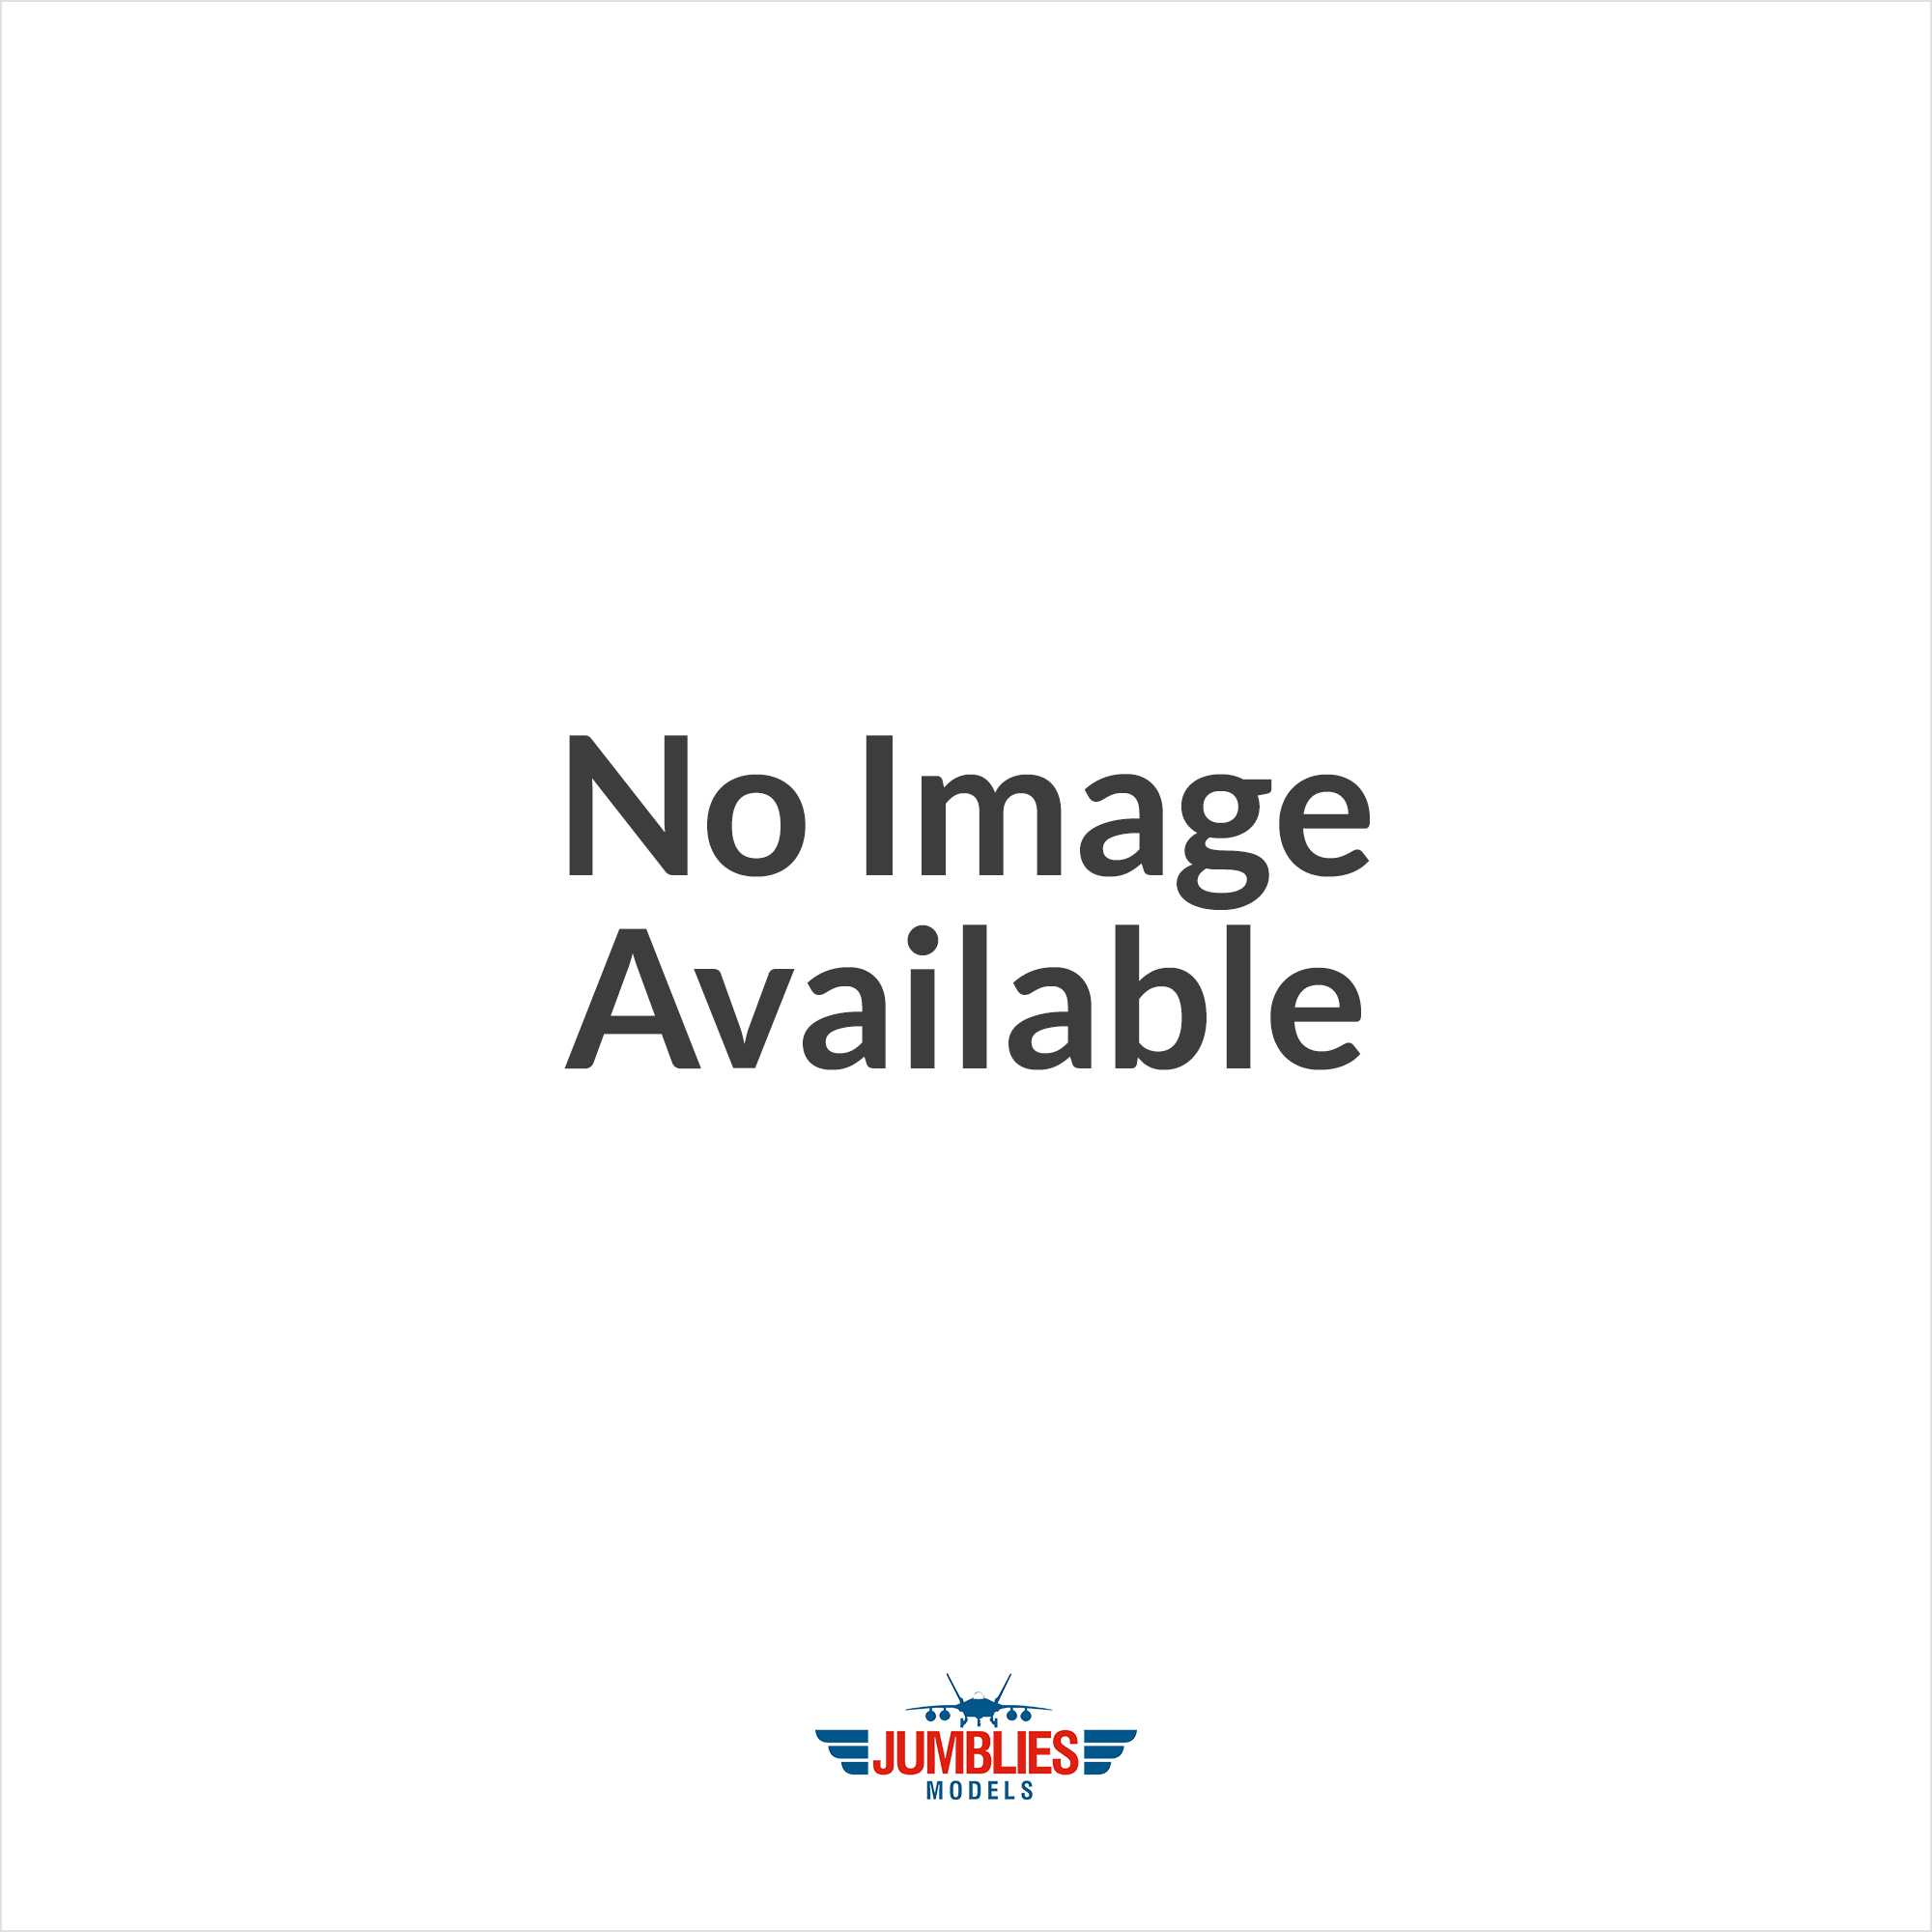 Minichamps 1:18 Ford Gt, Chip Ganassi Racing Uk, Pla/Mücke/Johnson, 24h Le Mans 2016 (Closed Body Range)